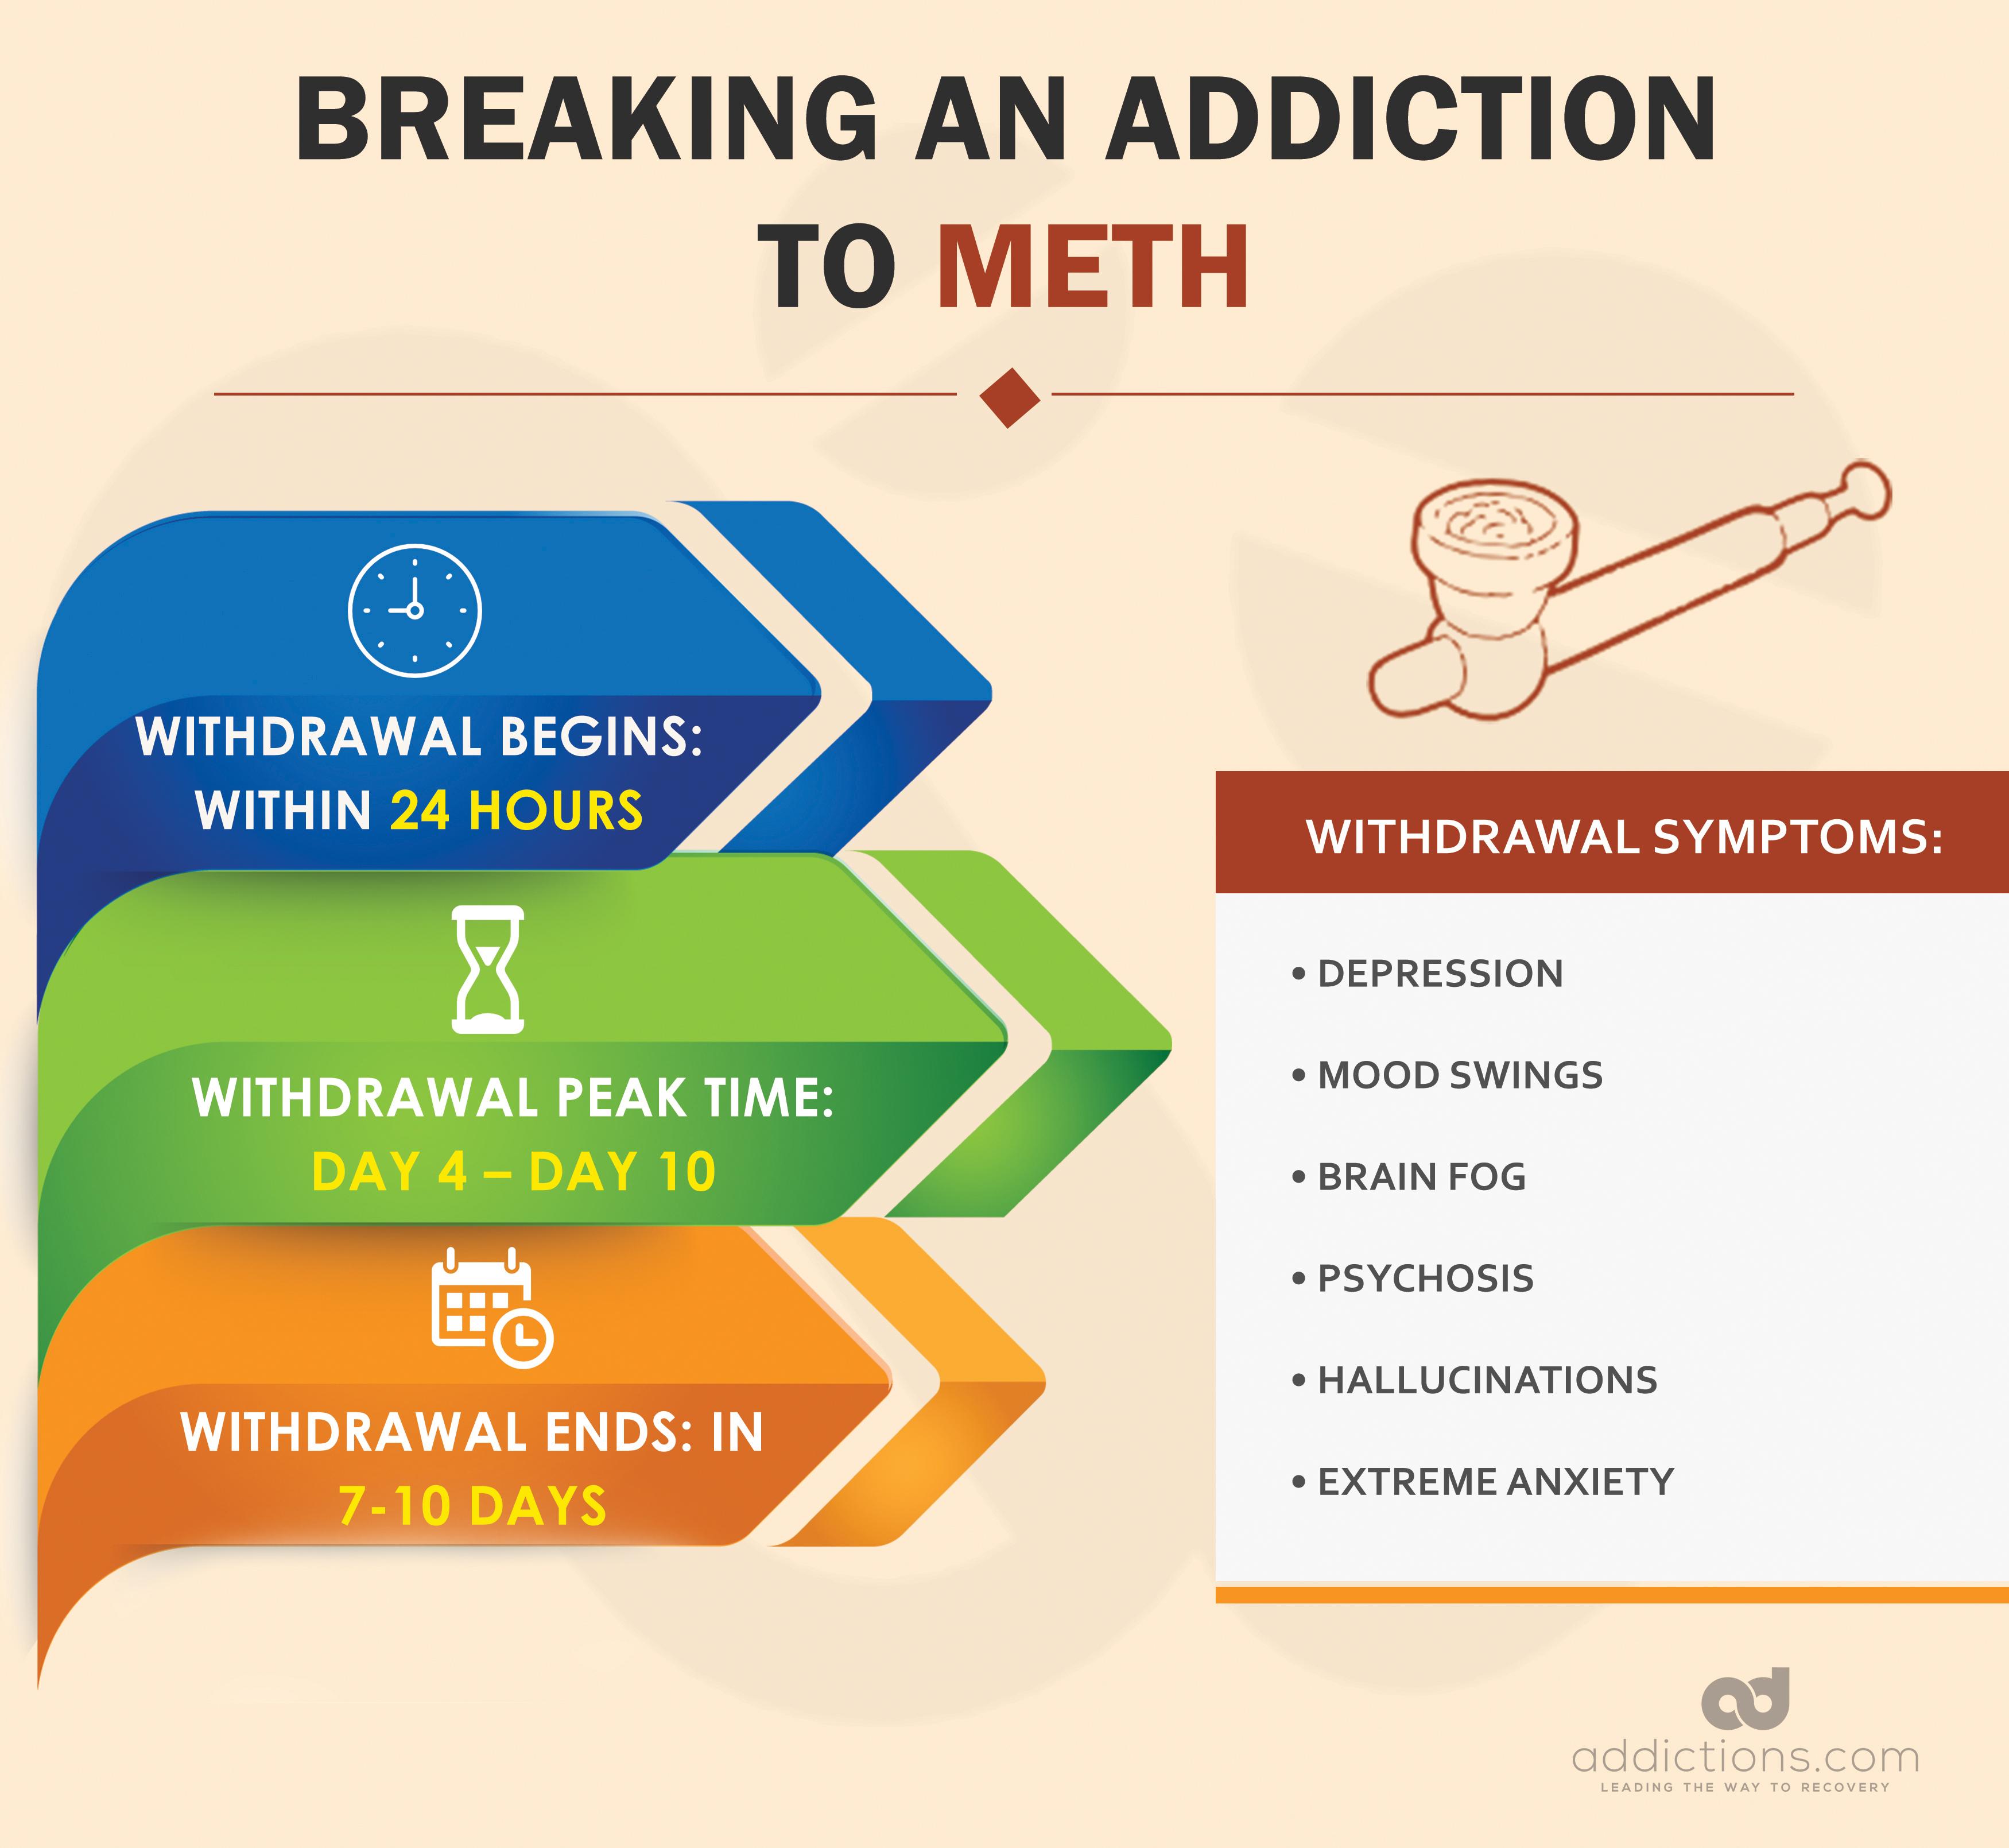 Breaking Addiction - How Long Does It Take to Break an